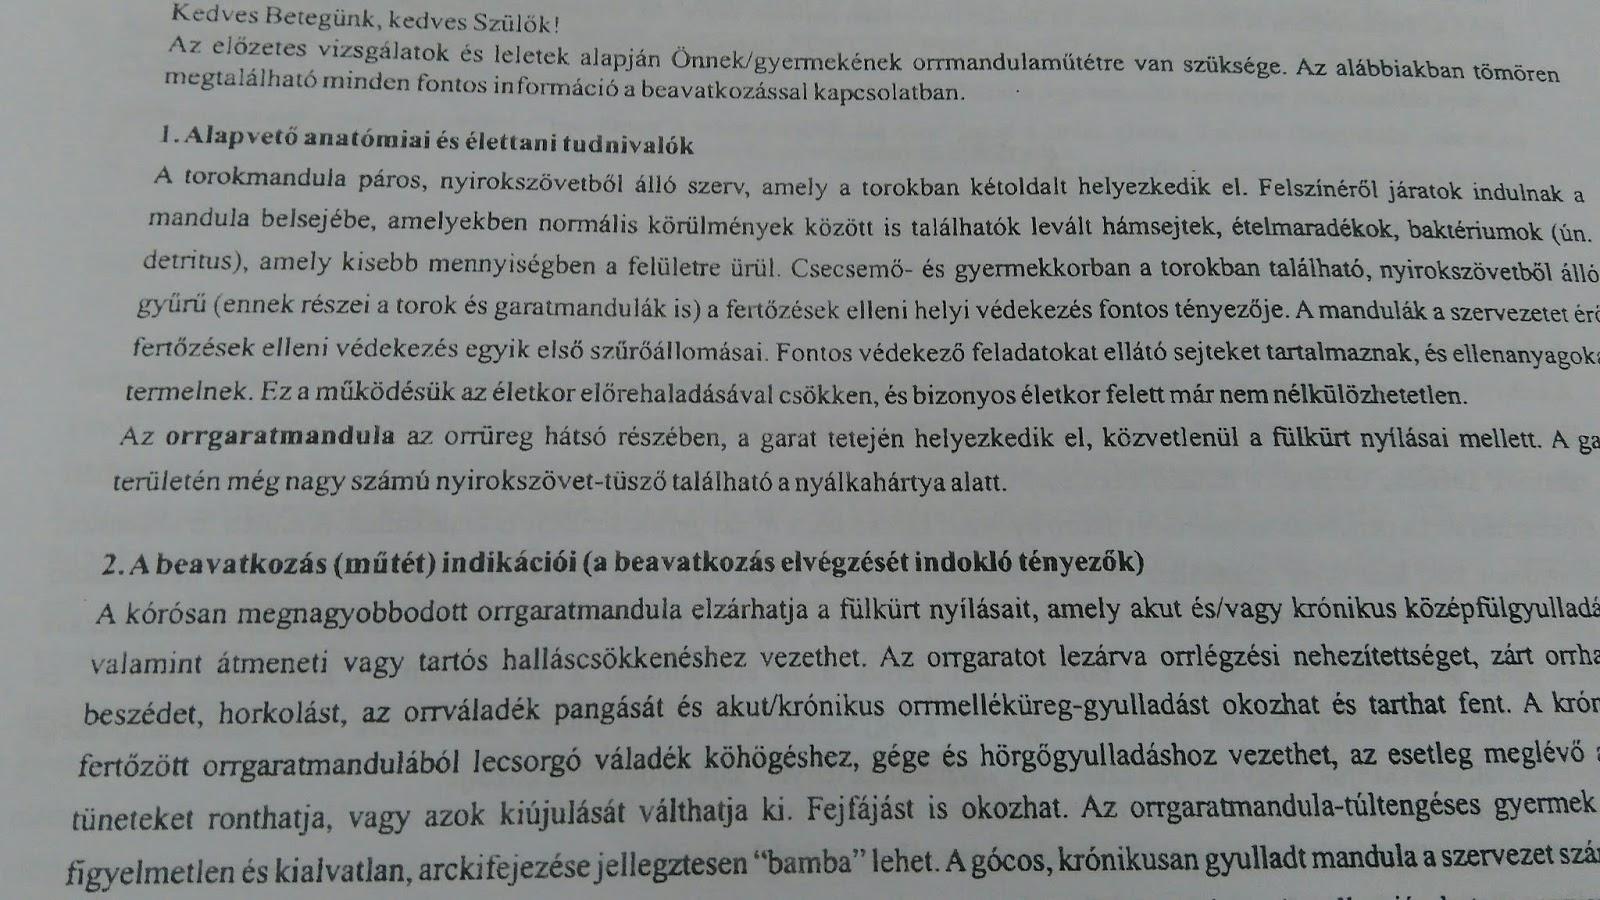 Orrmandula angolul